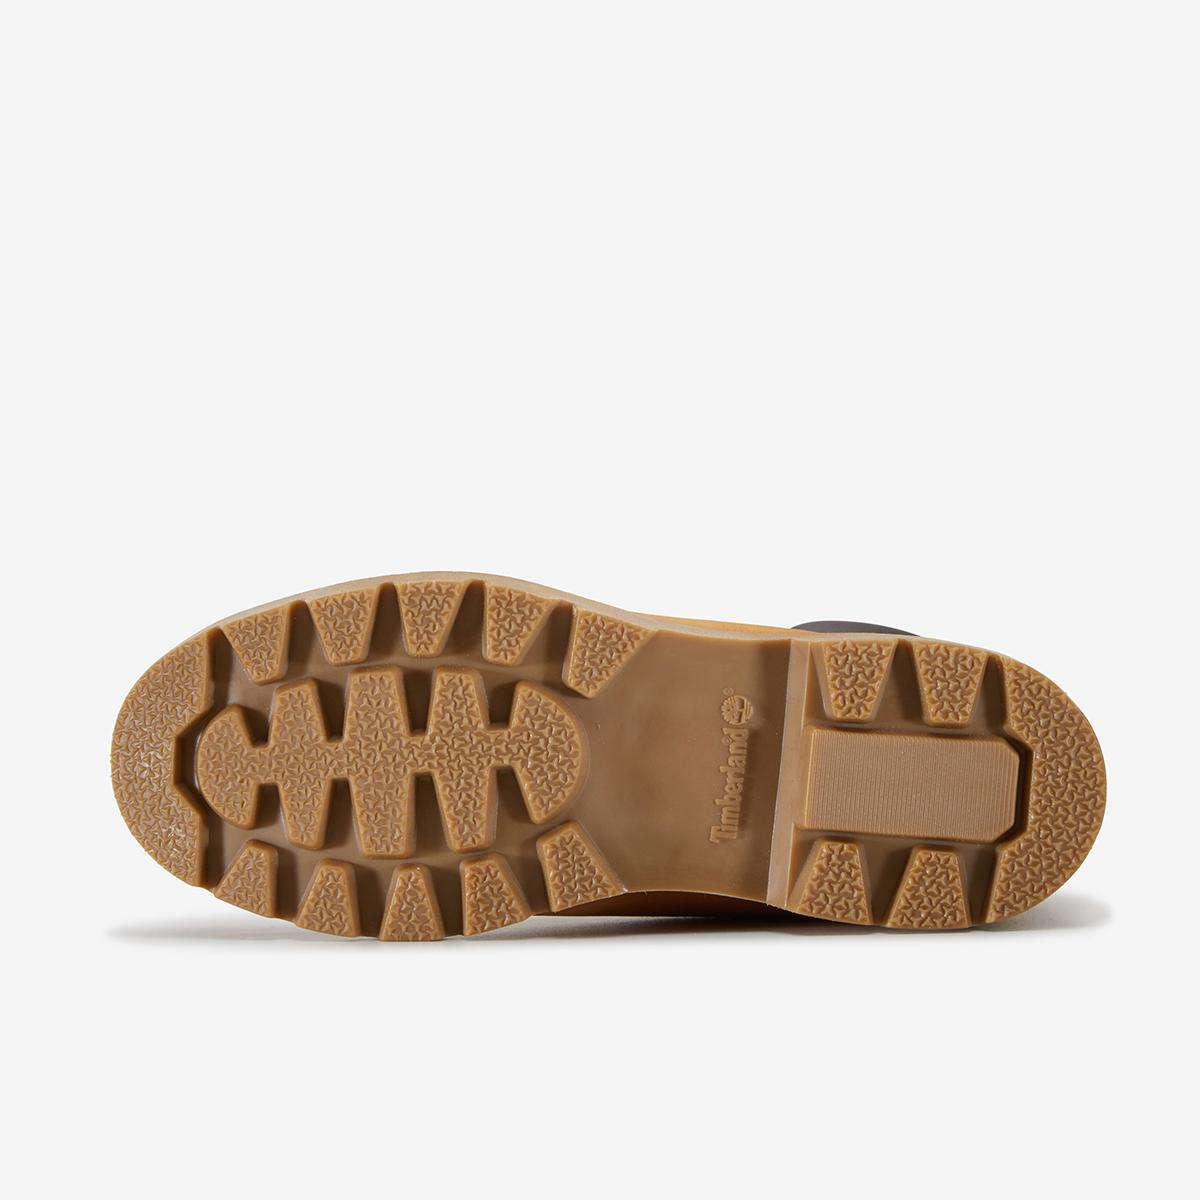 Timberland 6 Inch Basic Waterproof Boots